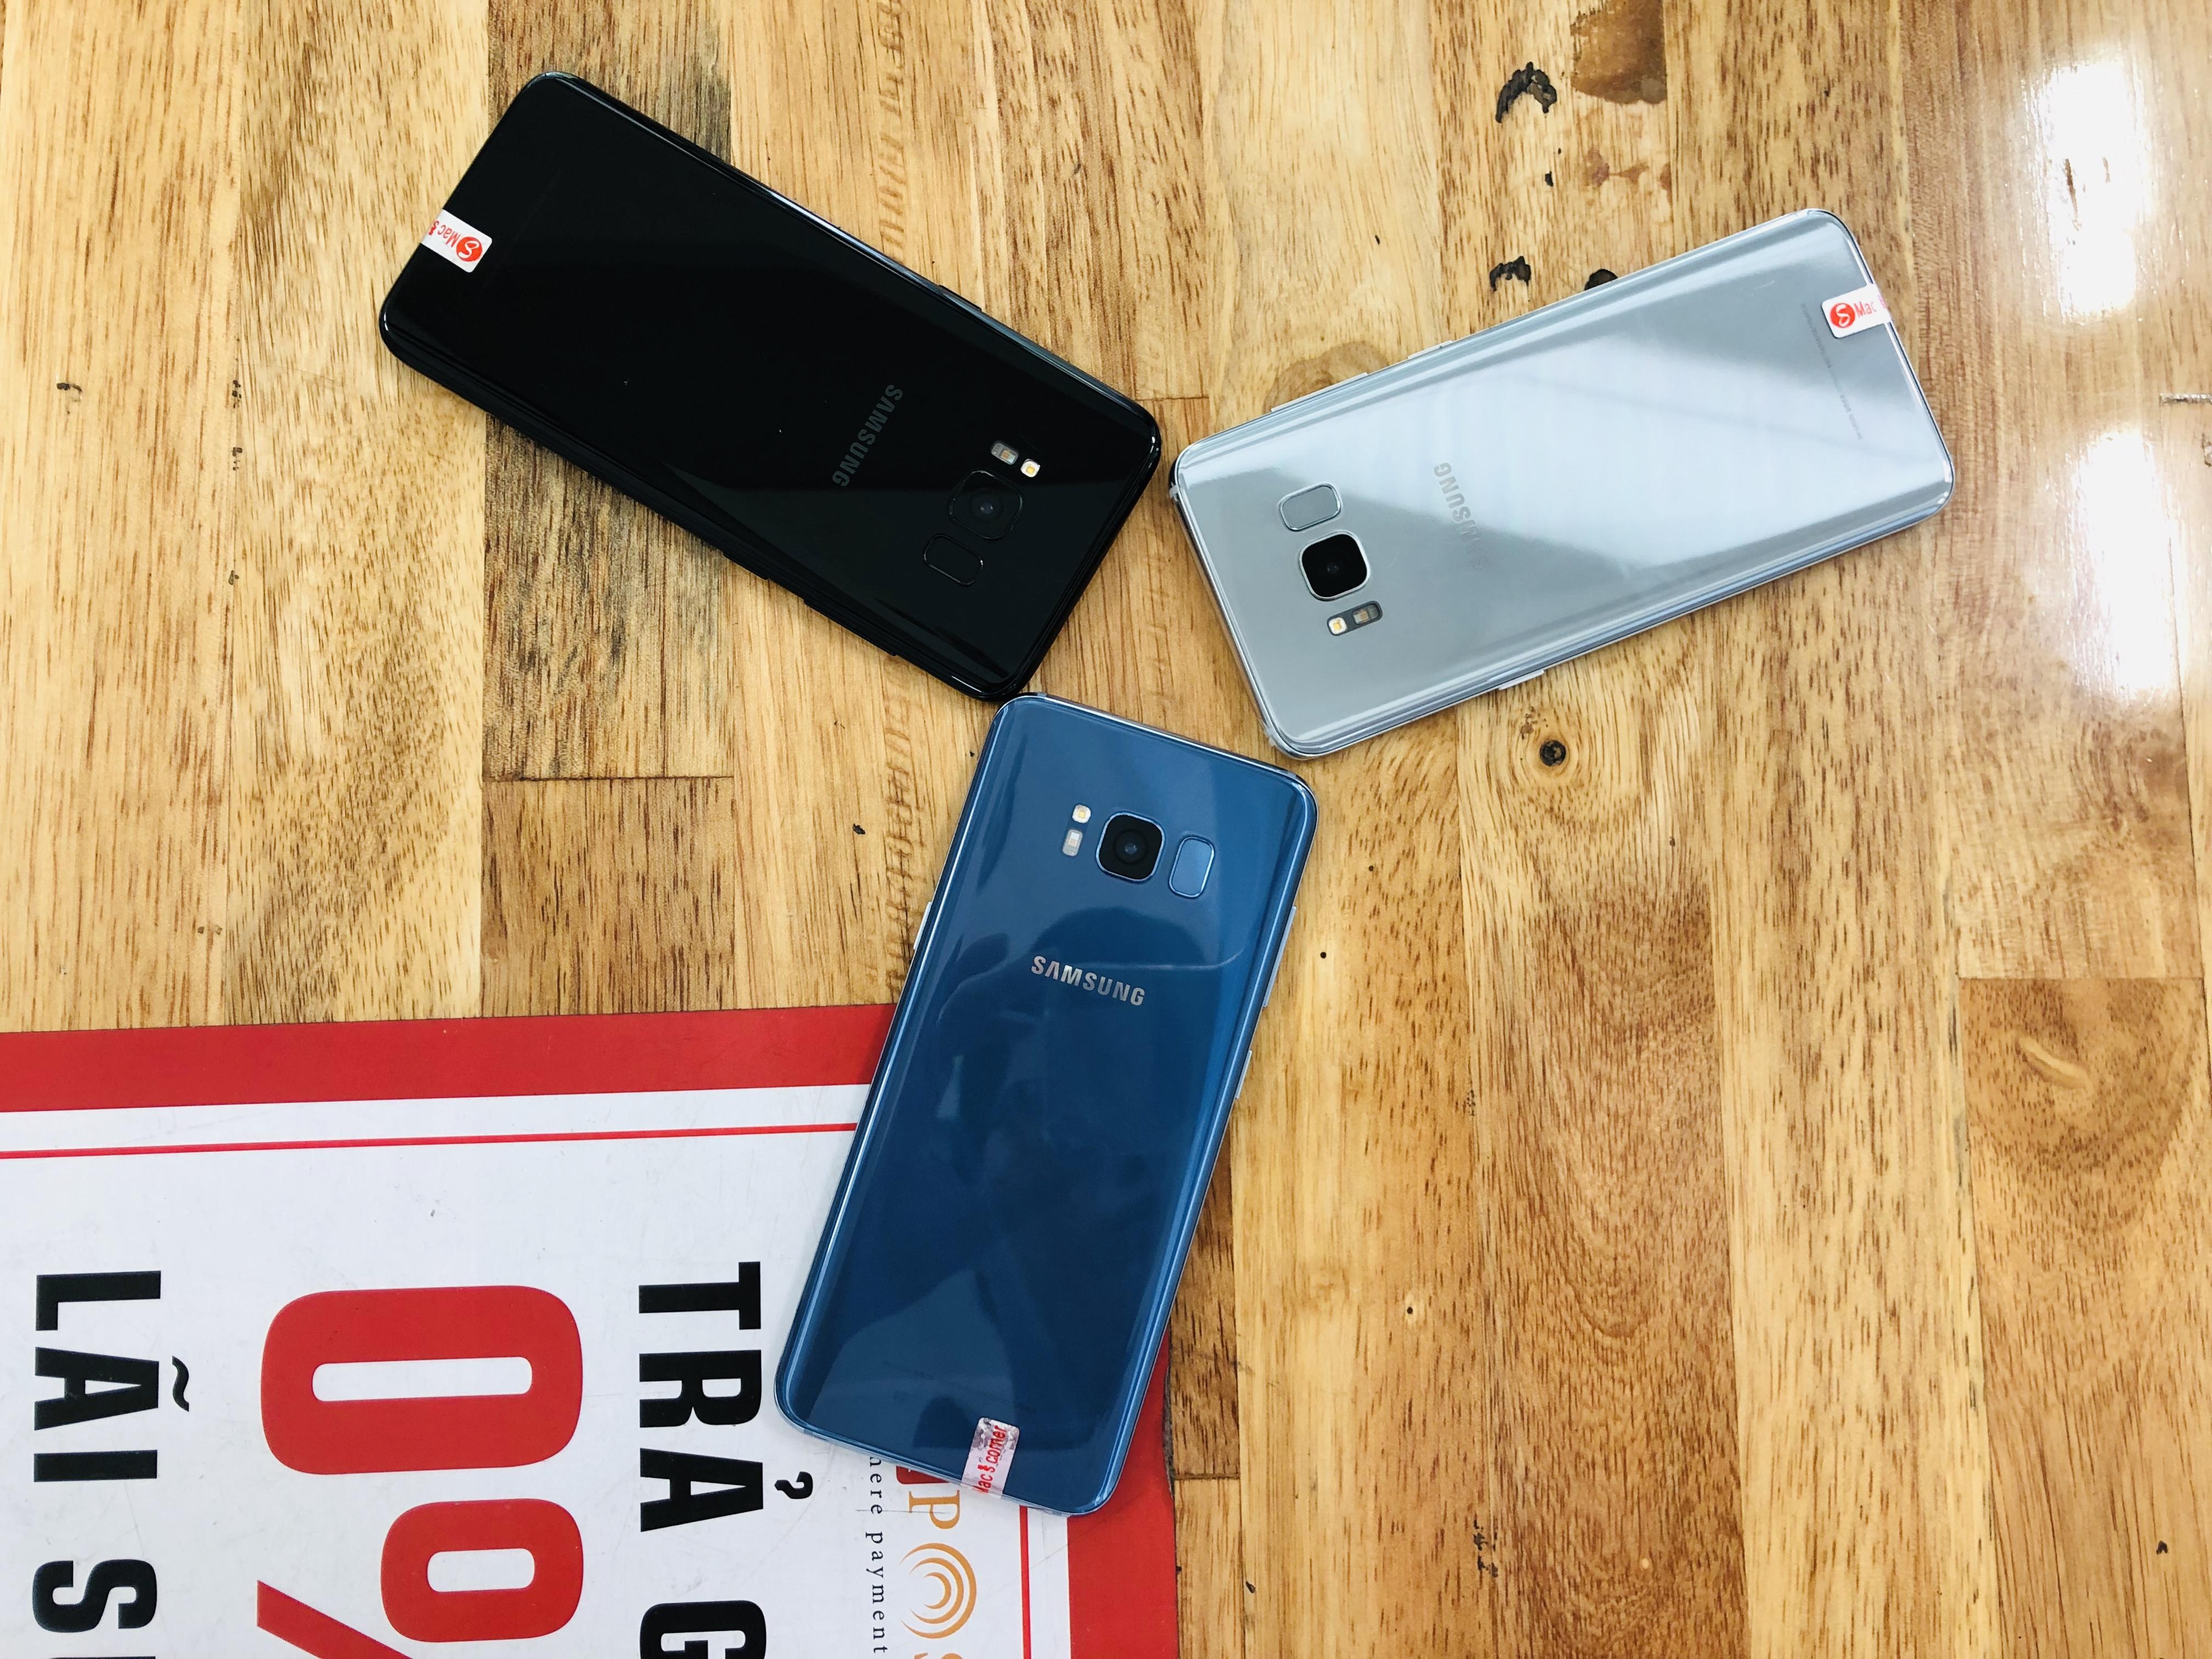 1 Samsung S8 Quốc Tế 2 Sim mới 99,99 tại 2C MOBILE